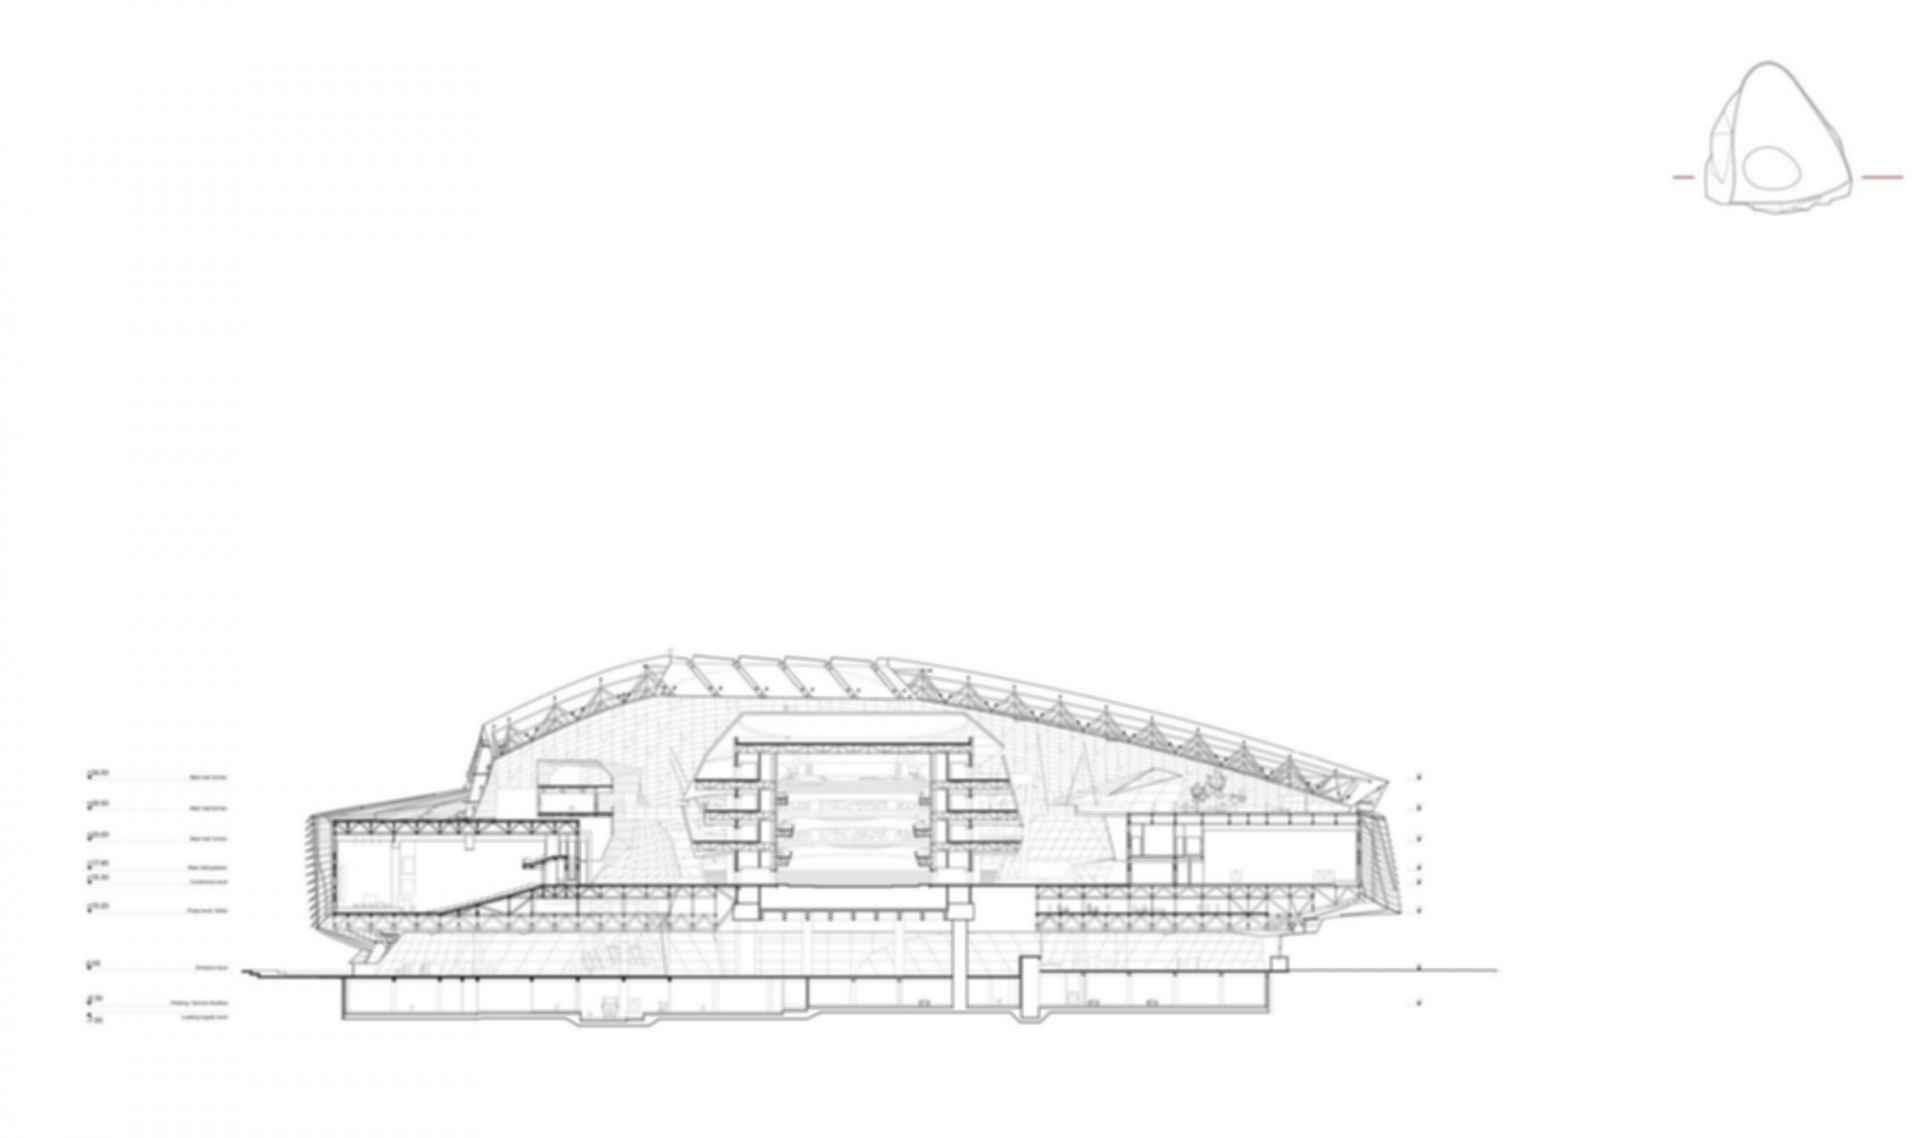 Dalian International Convention Center - Floor Plan